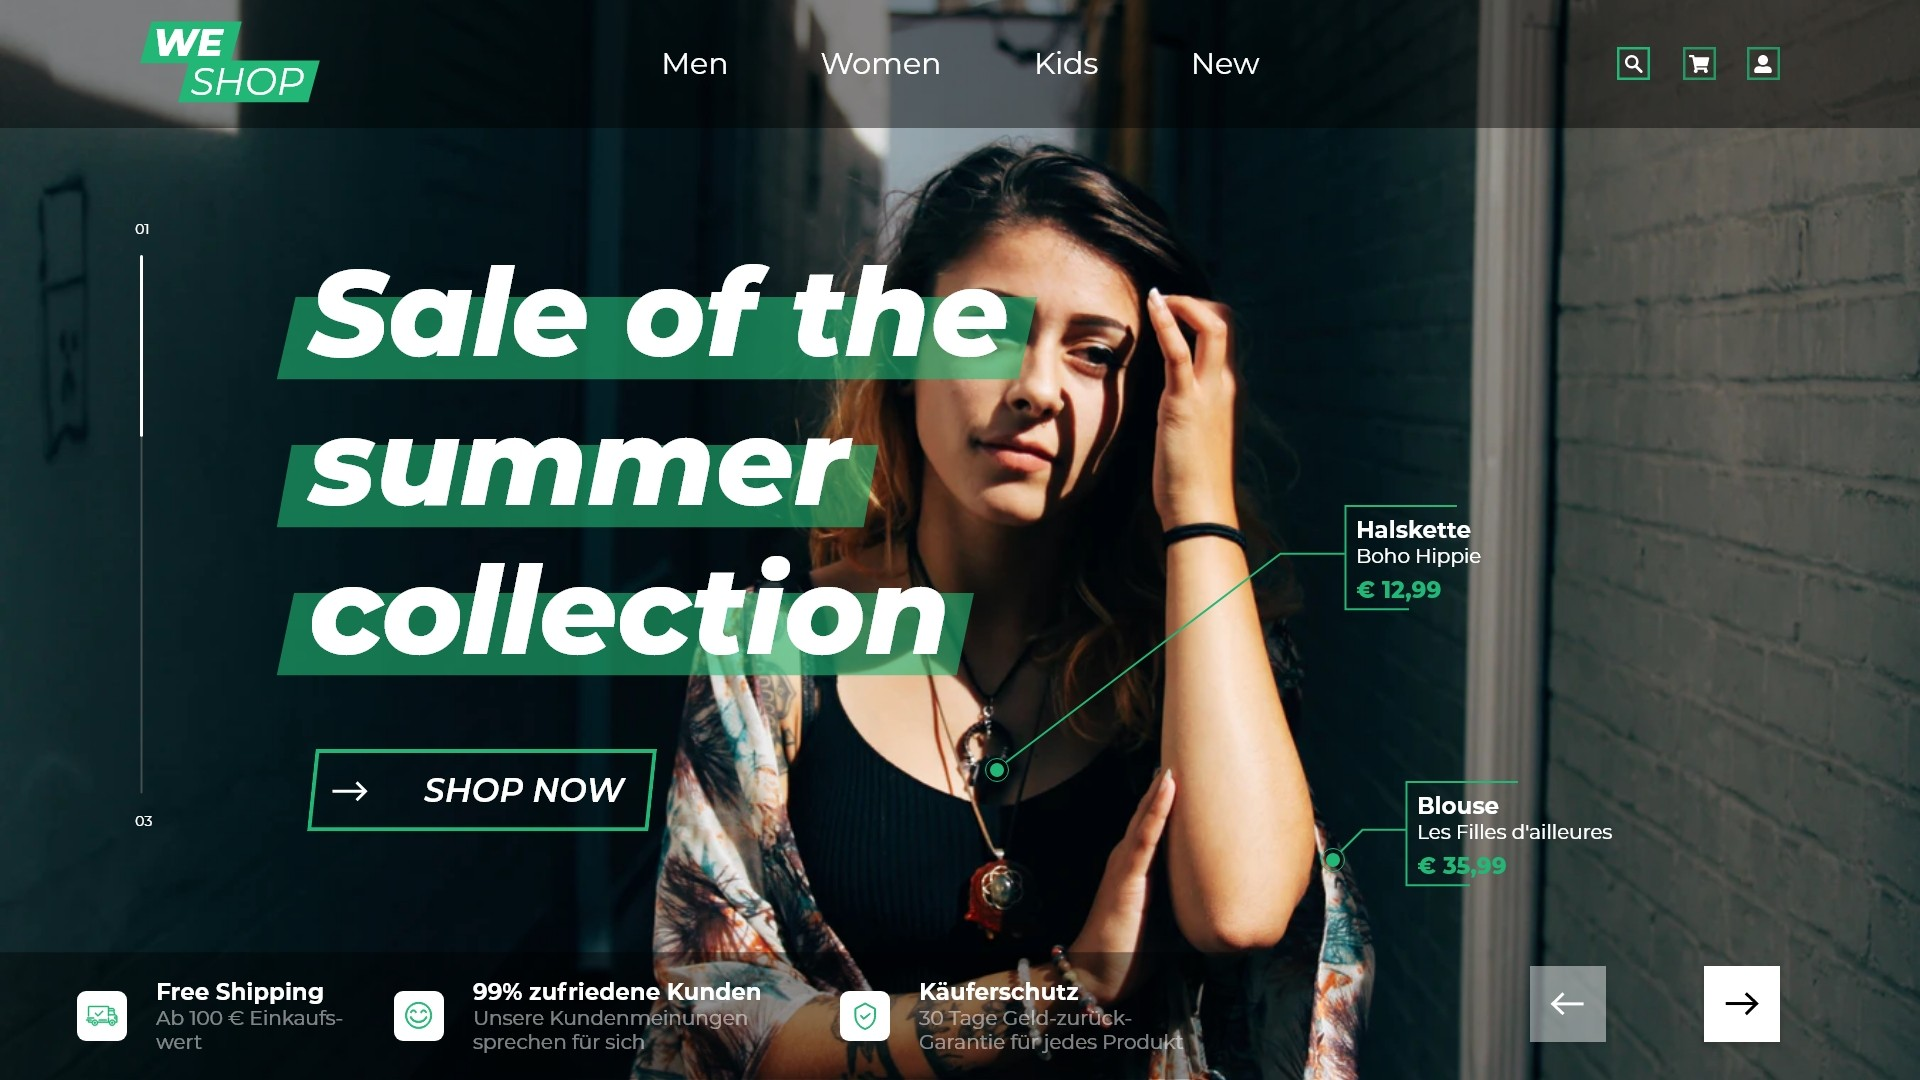 Landingpage Online WEshop